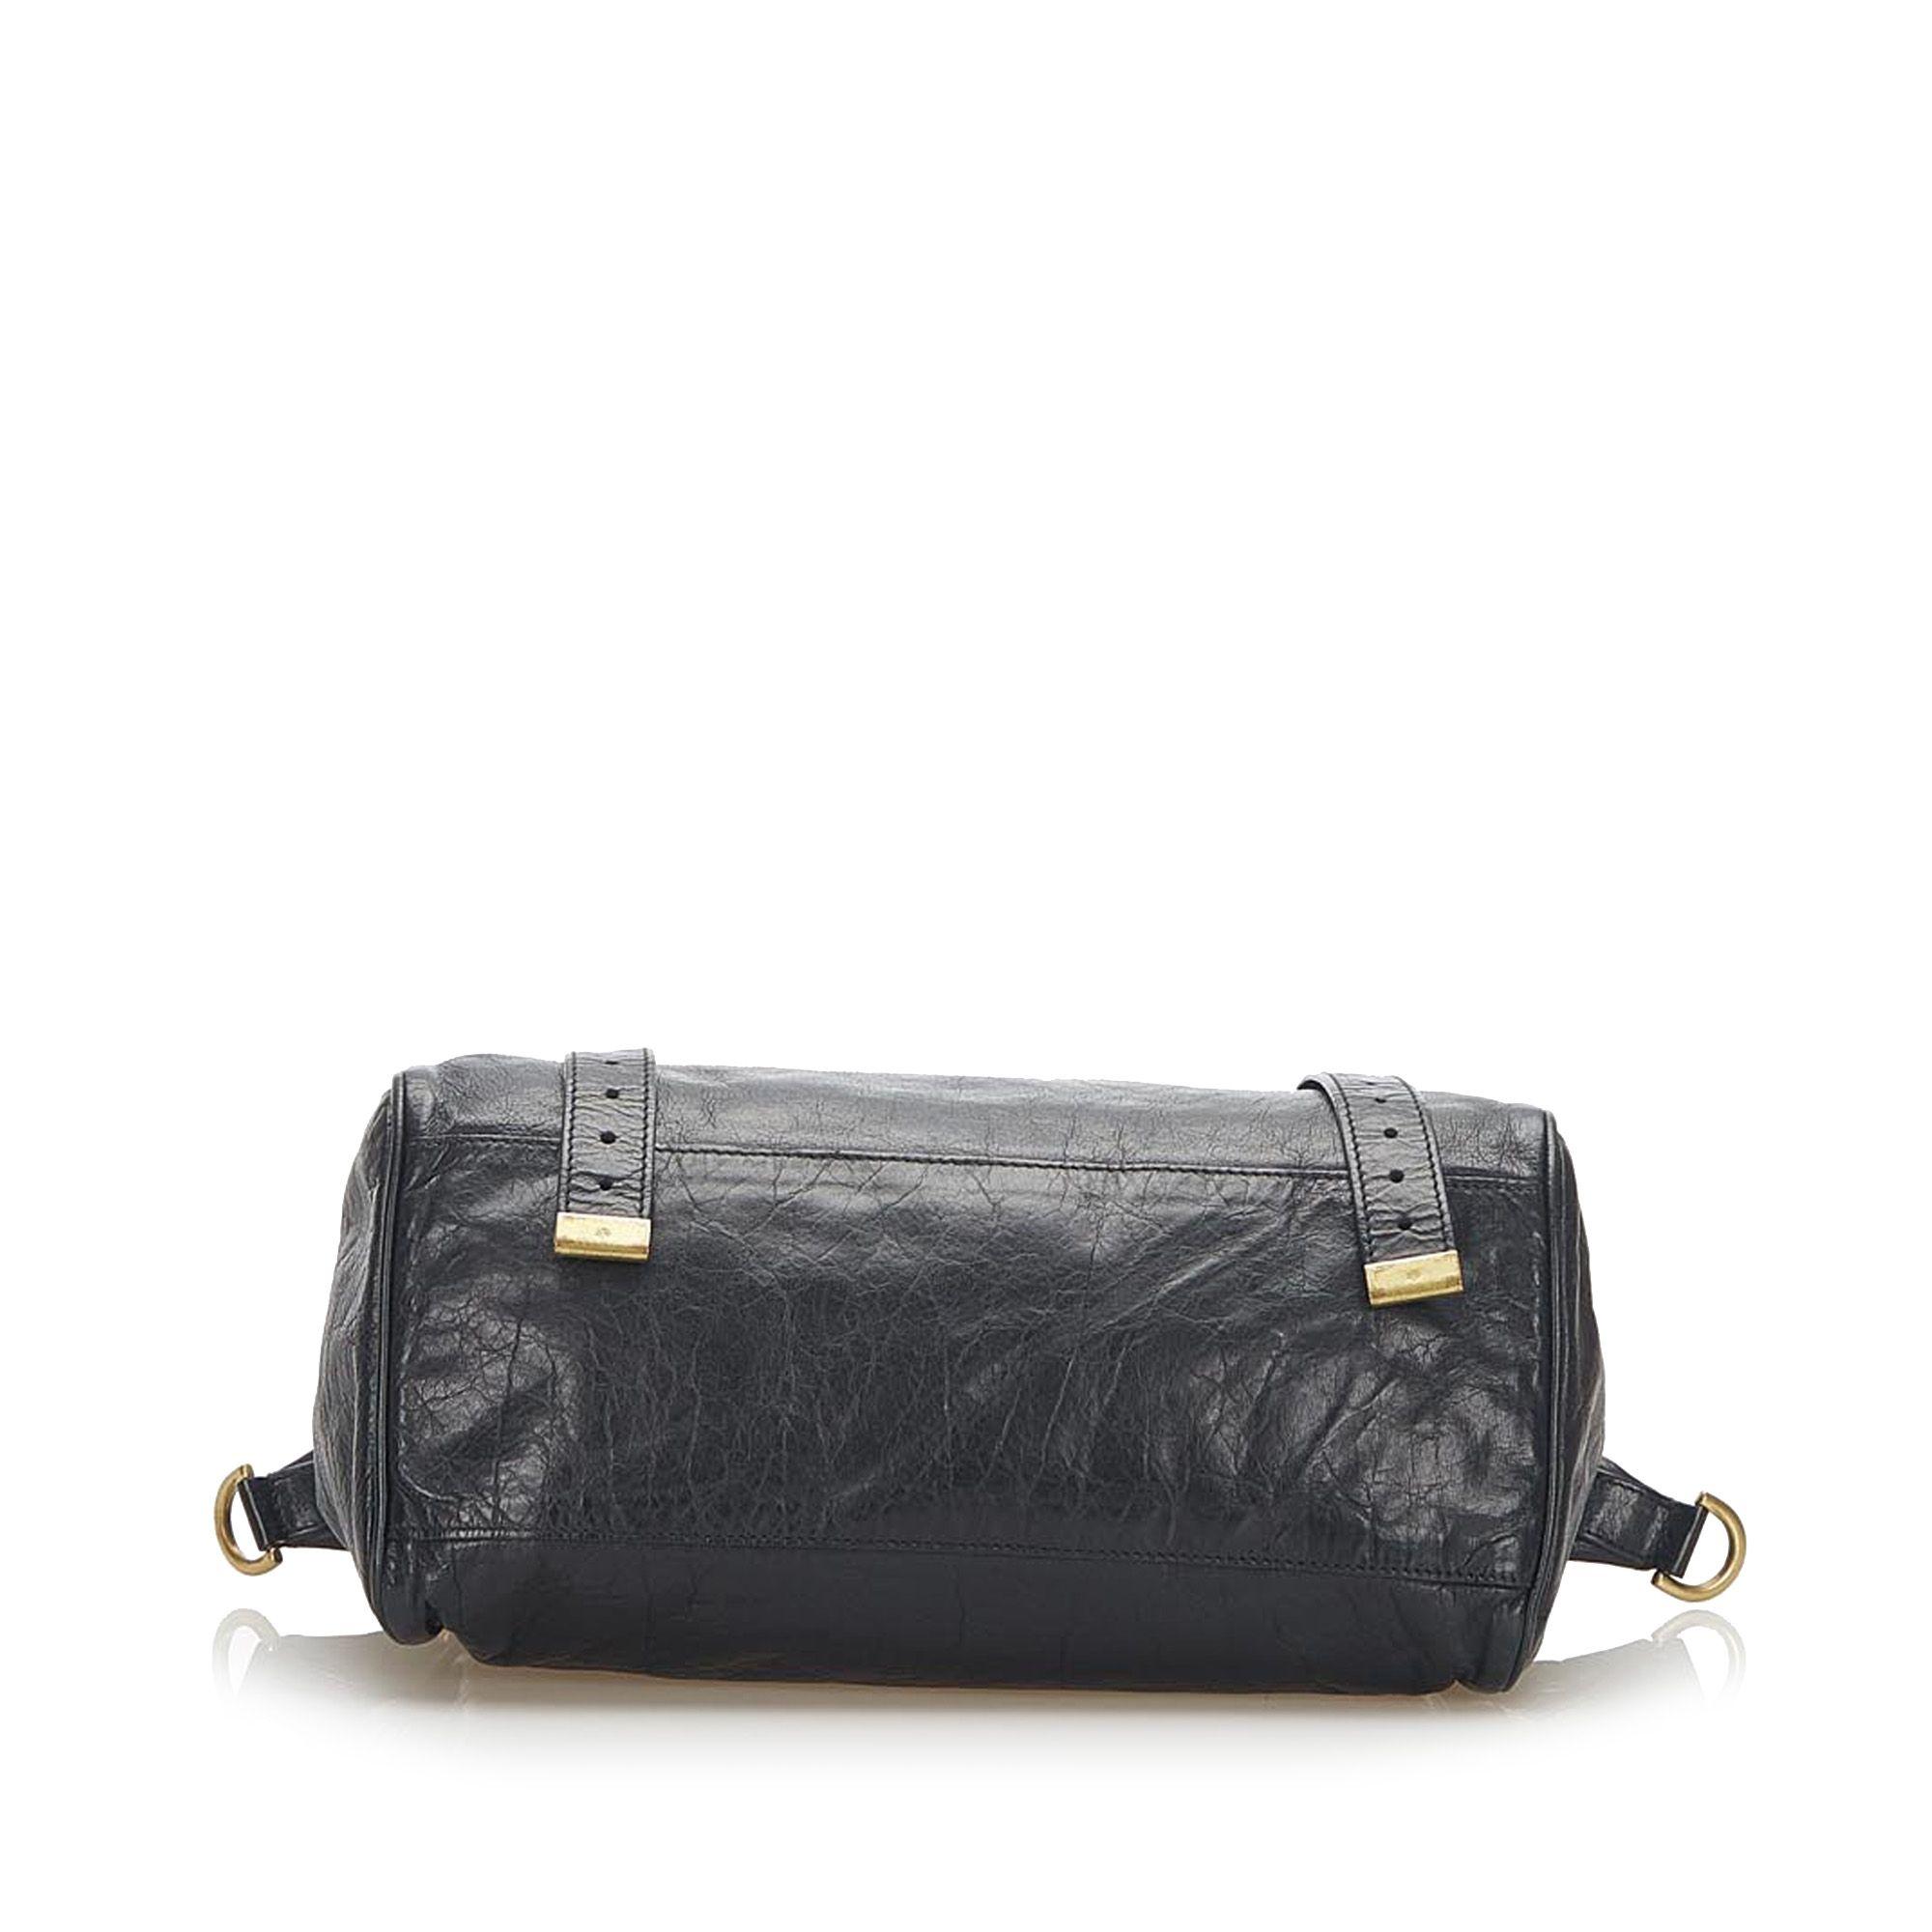 Vintage Mulberry Alexa Leather Satchel Black